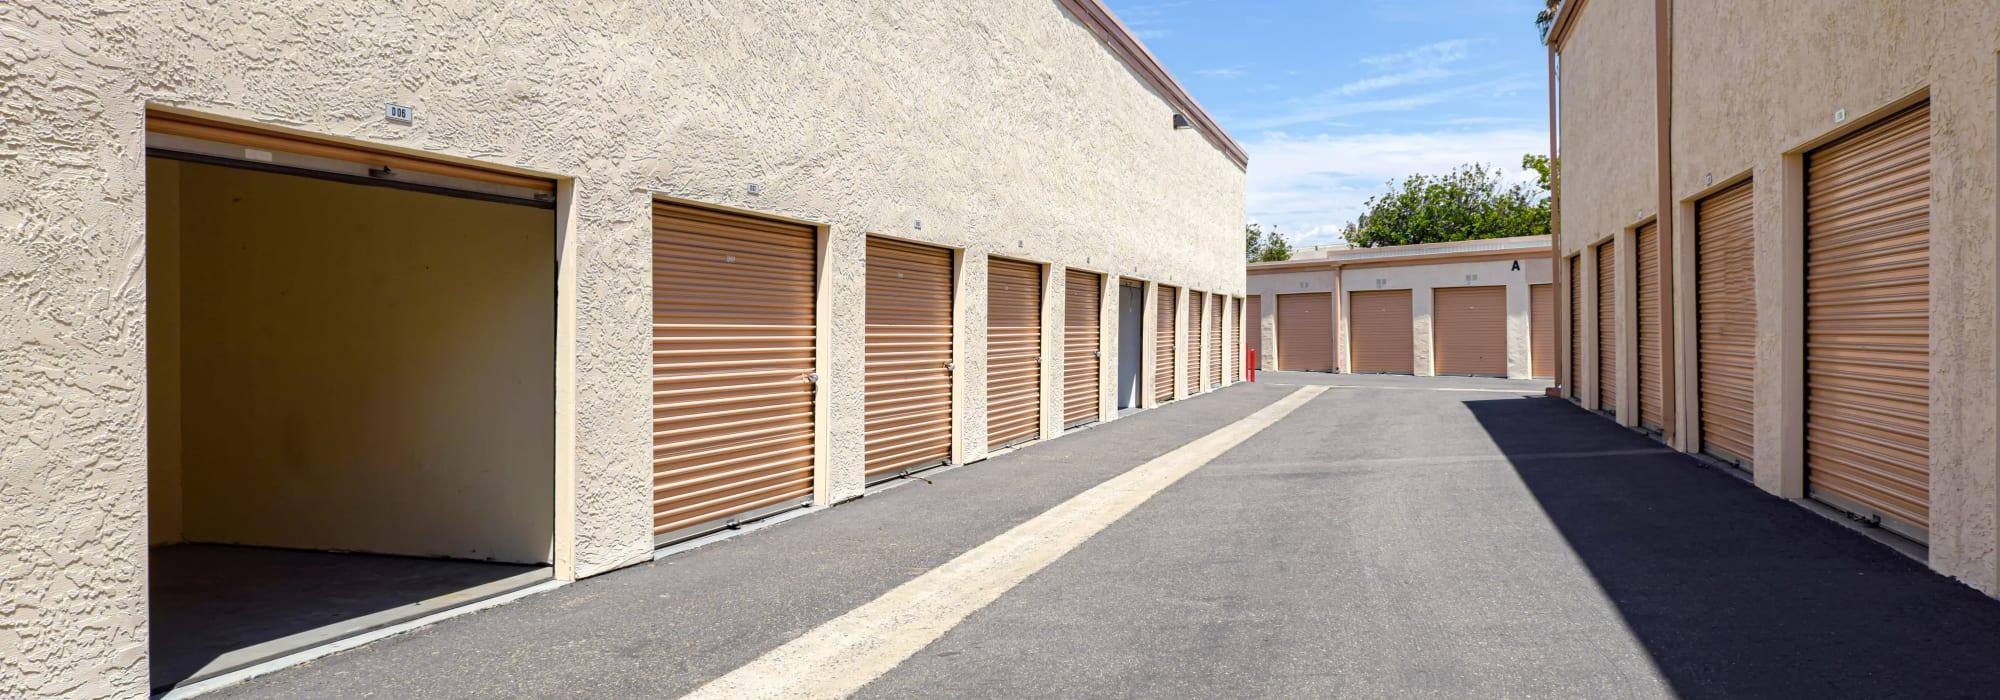 Outdoor units at San Marcos Mini Storage in San Marcos, California